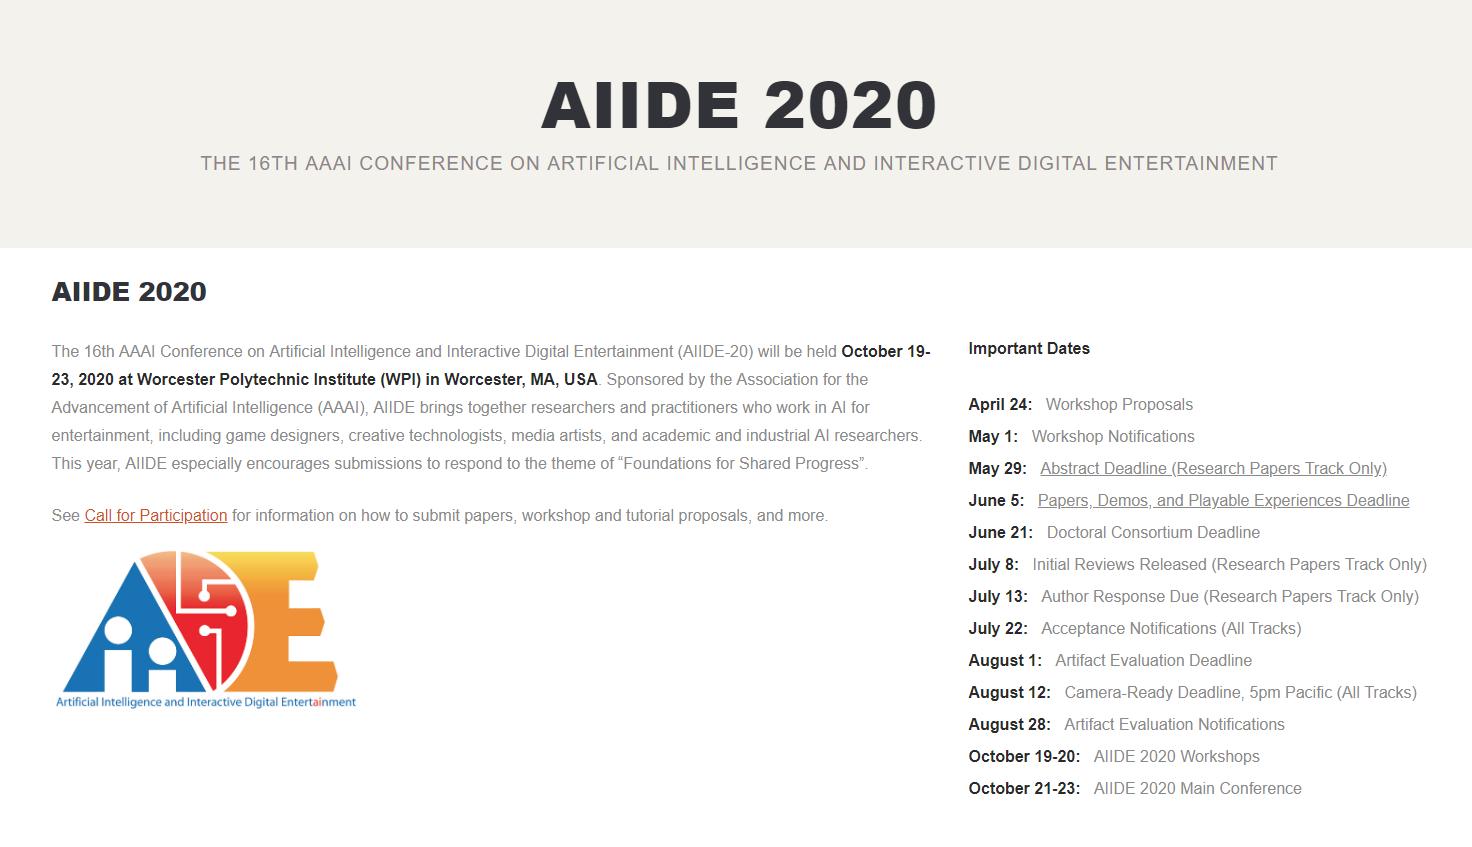 AIIDE 2020